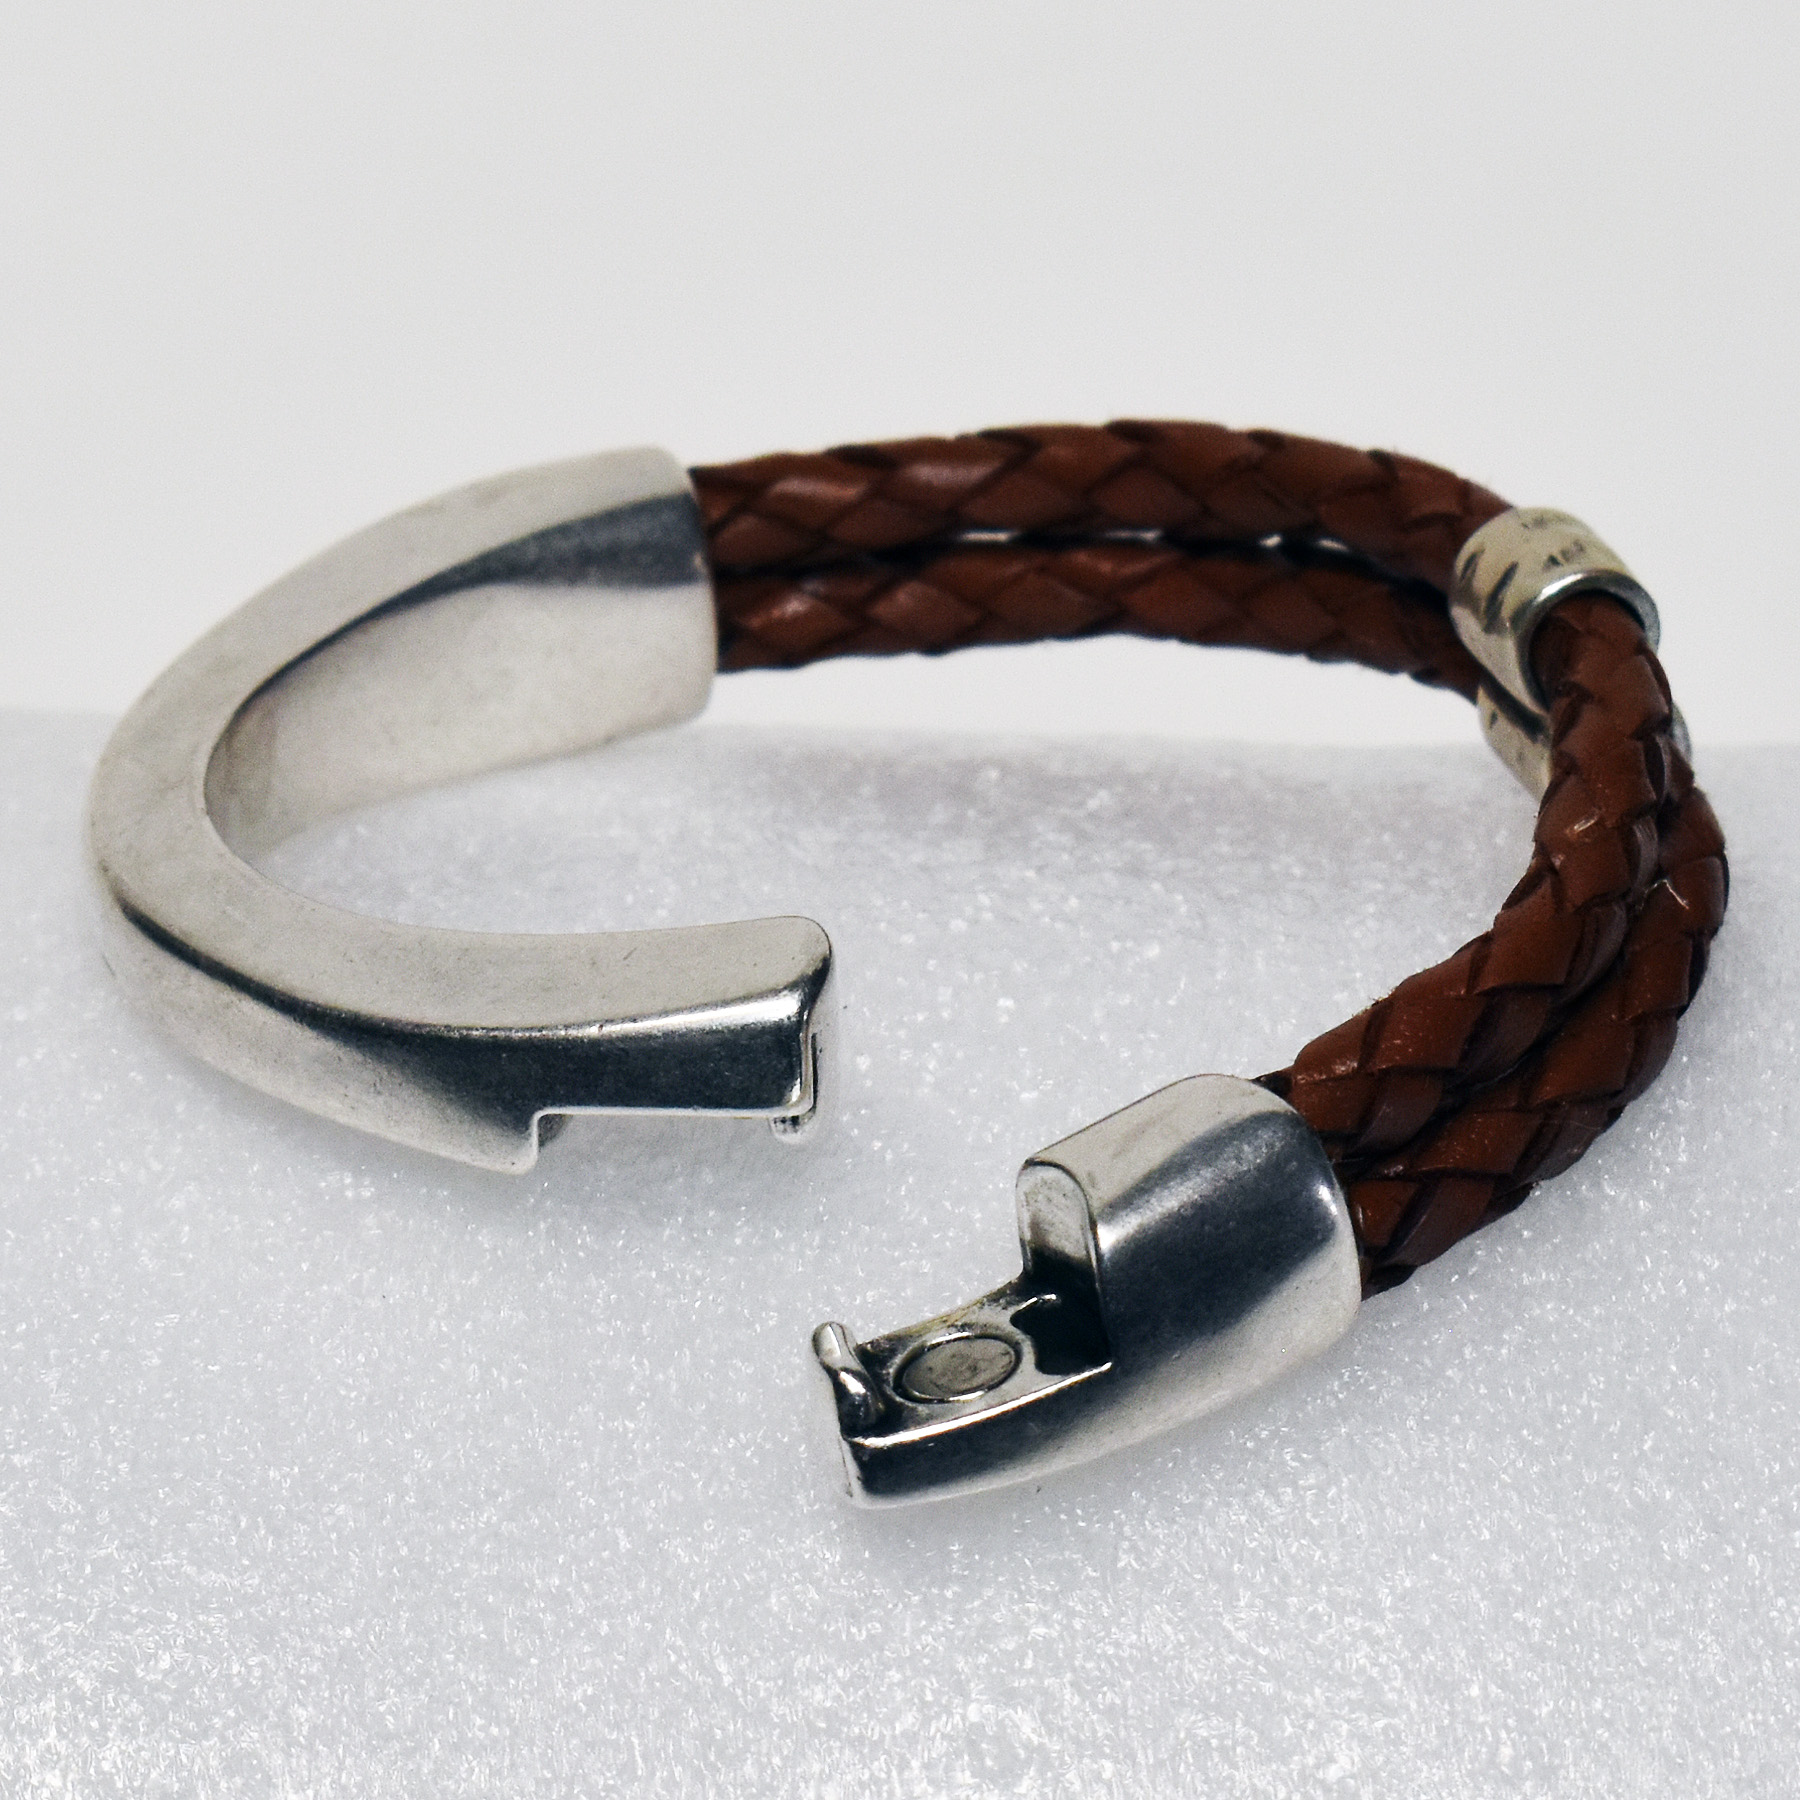 JekylsHydes_Bracelets__0027_007B